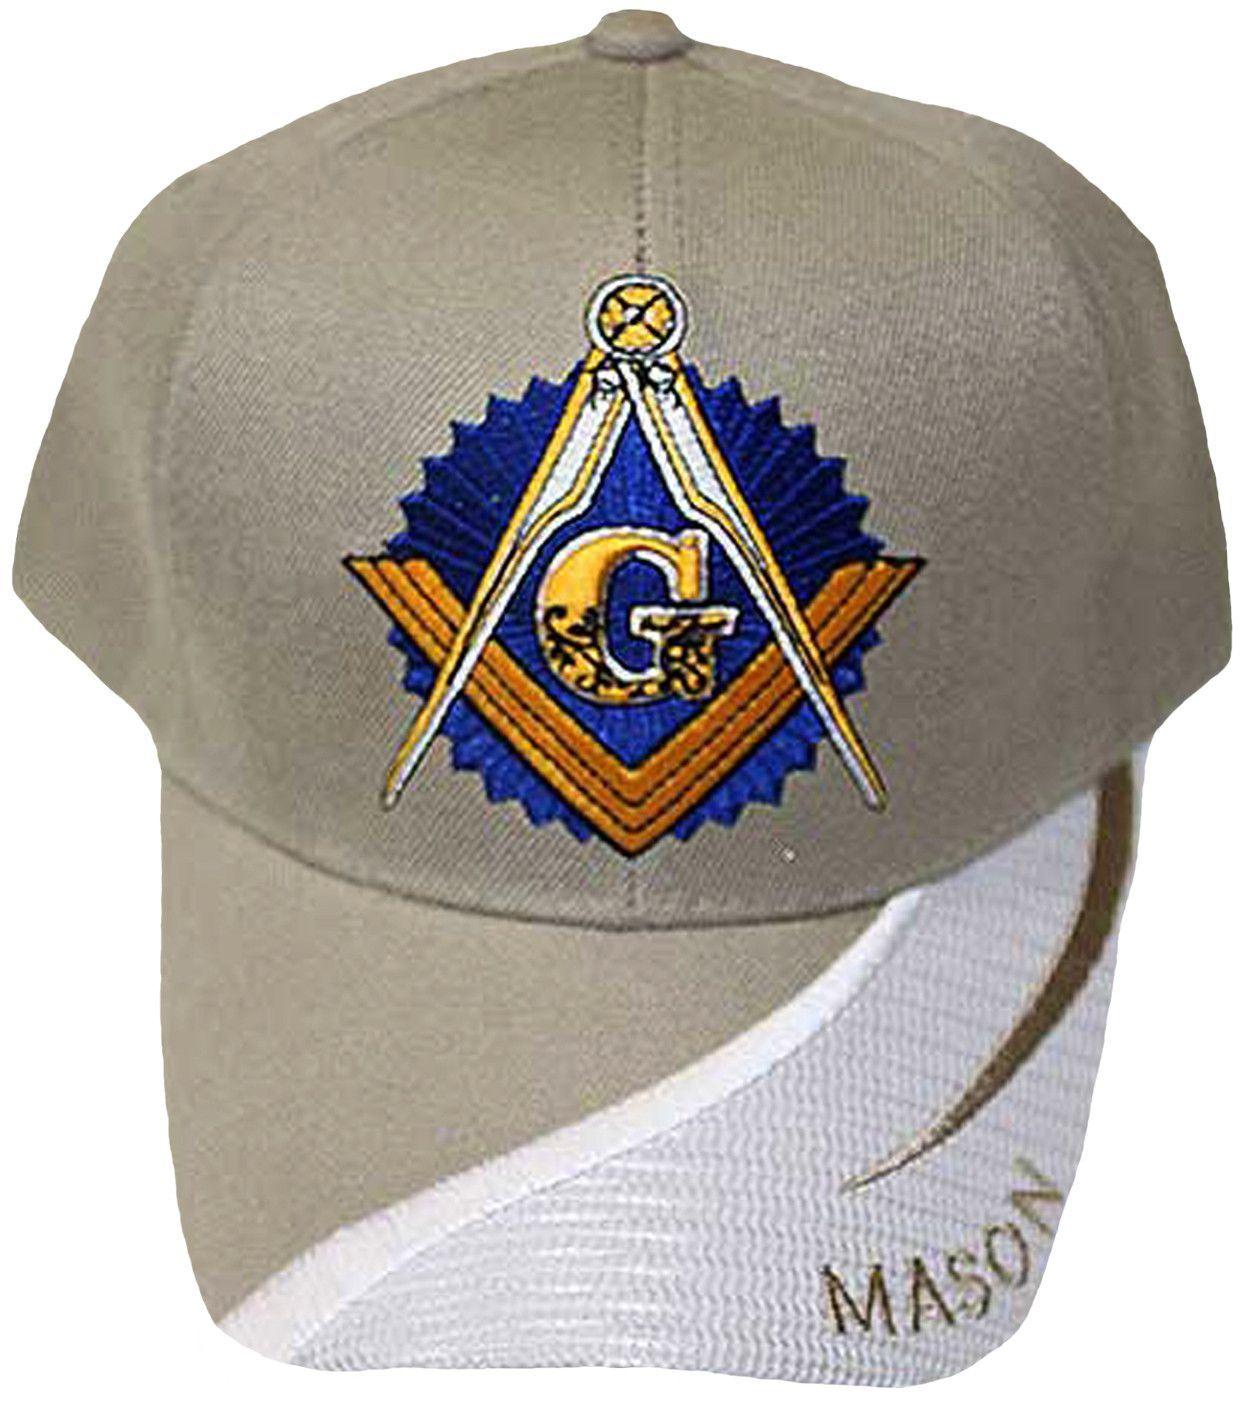 8758cea4e54c7 Tan and White Masonic Baseball Cap Master Mason Logo Hat for Freemasons  Shriners Prince Hall Masons Headwear